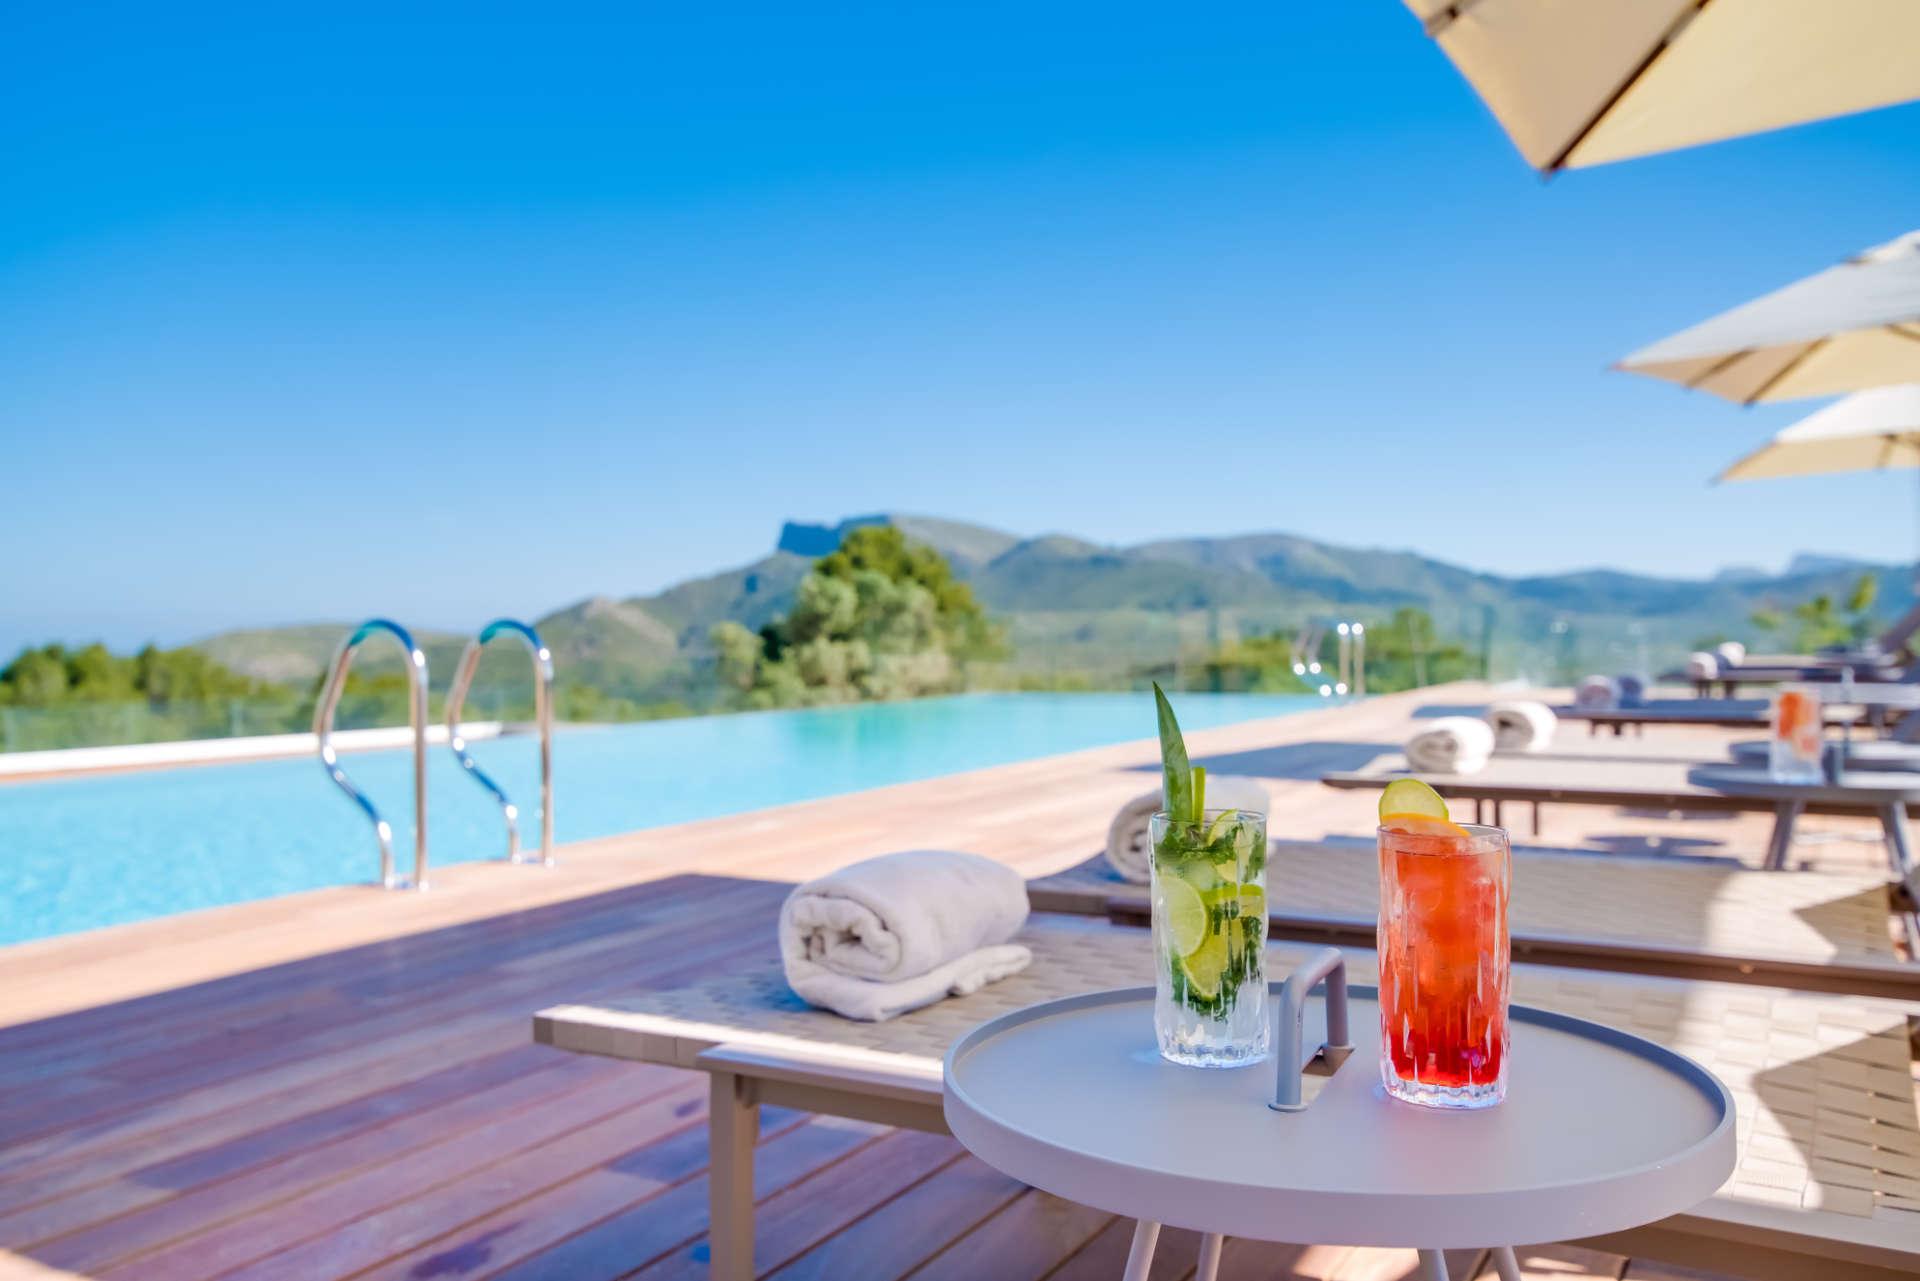 Spa Villas Mallorca Pool